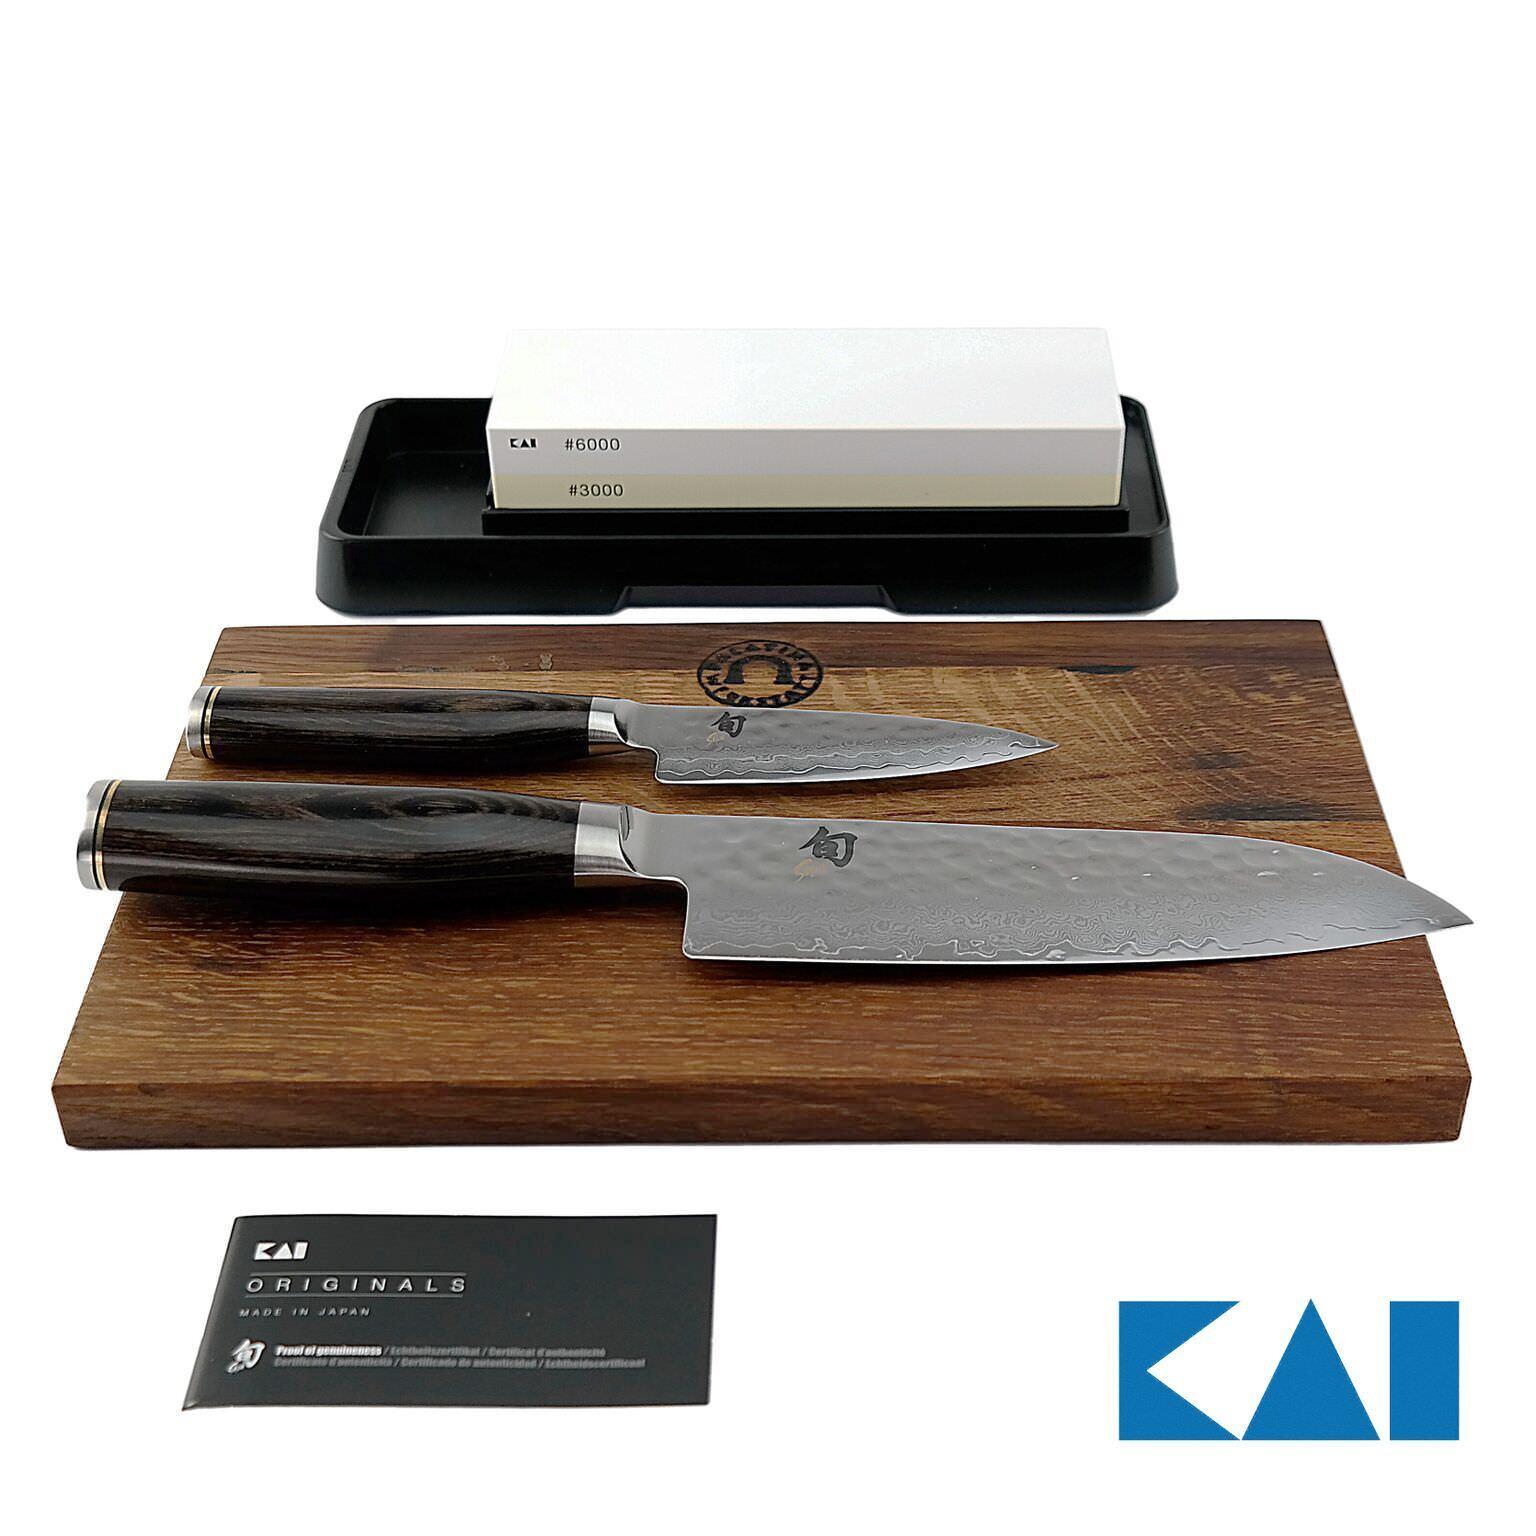 Kai Chun Tim malteurs Set, Office couteau tdm-1700; Santoku tdm-1702, AP -0316+ PLANCHE